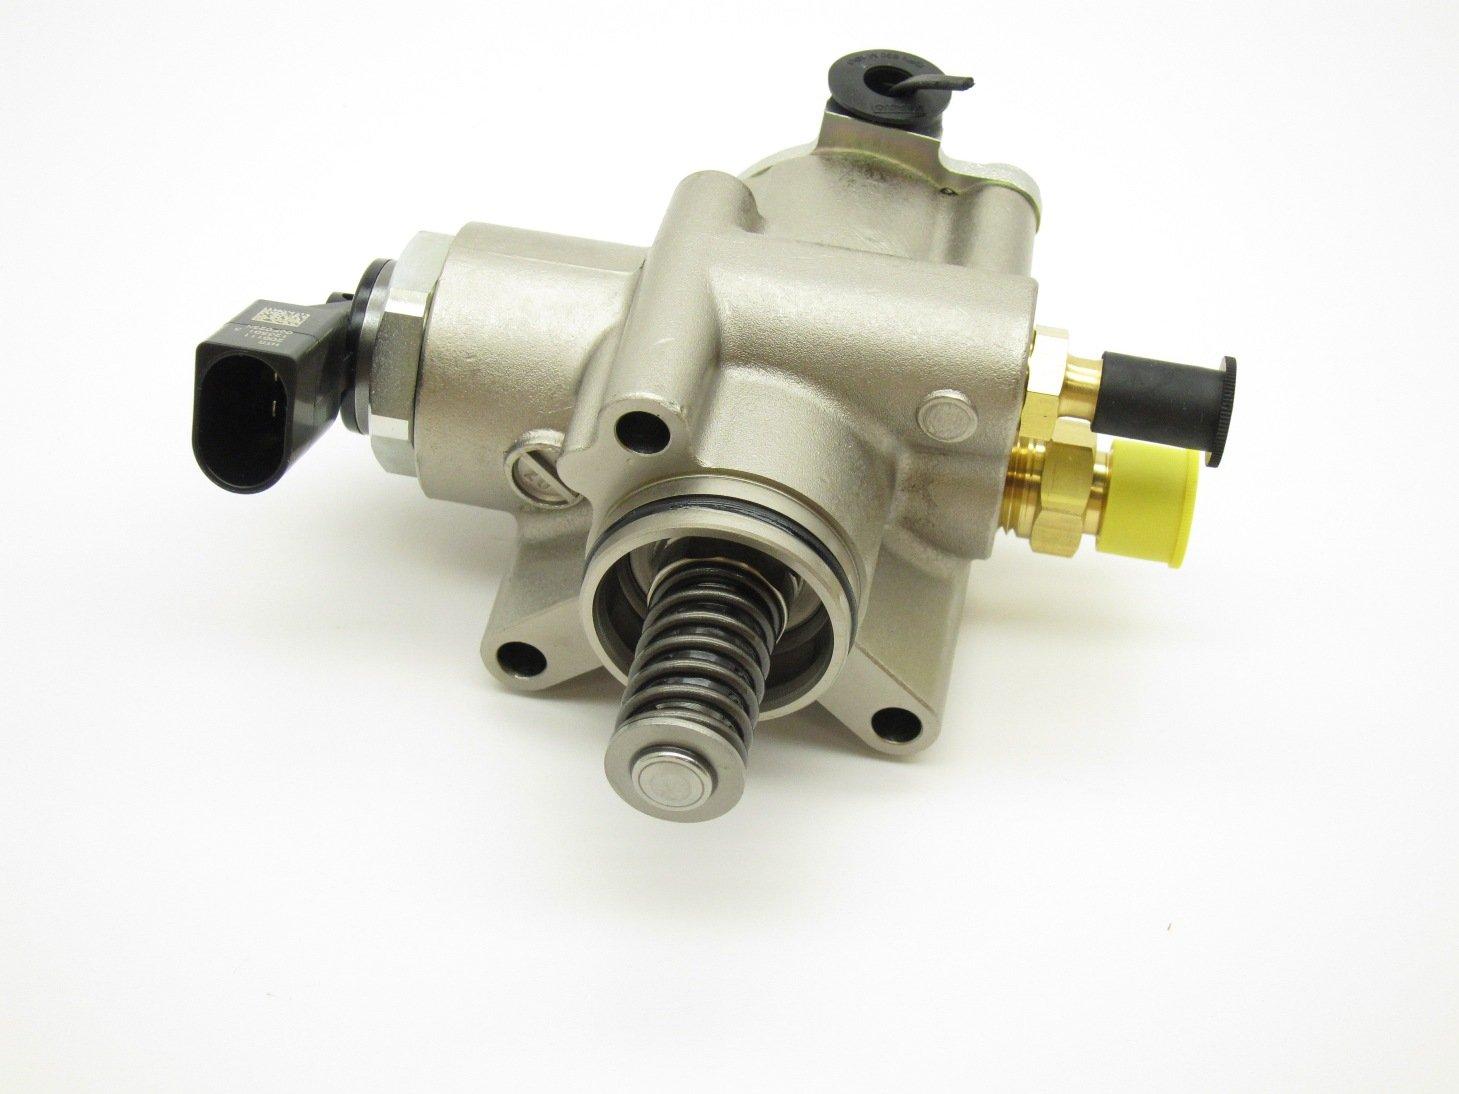 06f 127 025 K High Pressure Fuel Pump 06 08 Jetta Passat Audi A3 2 0t Engine Diagram Gti Rabbit Eos Automotive